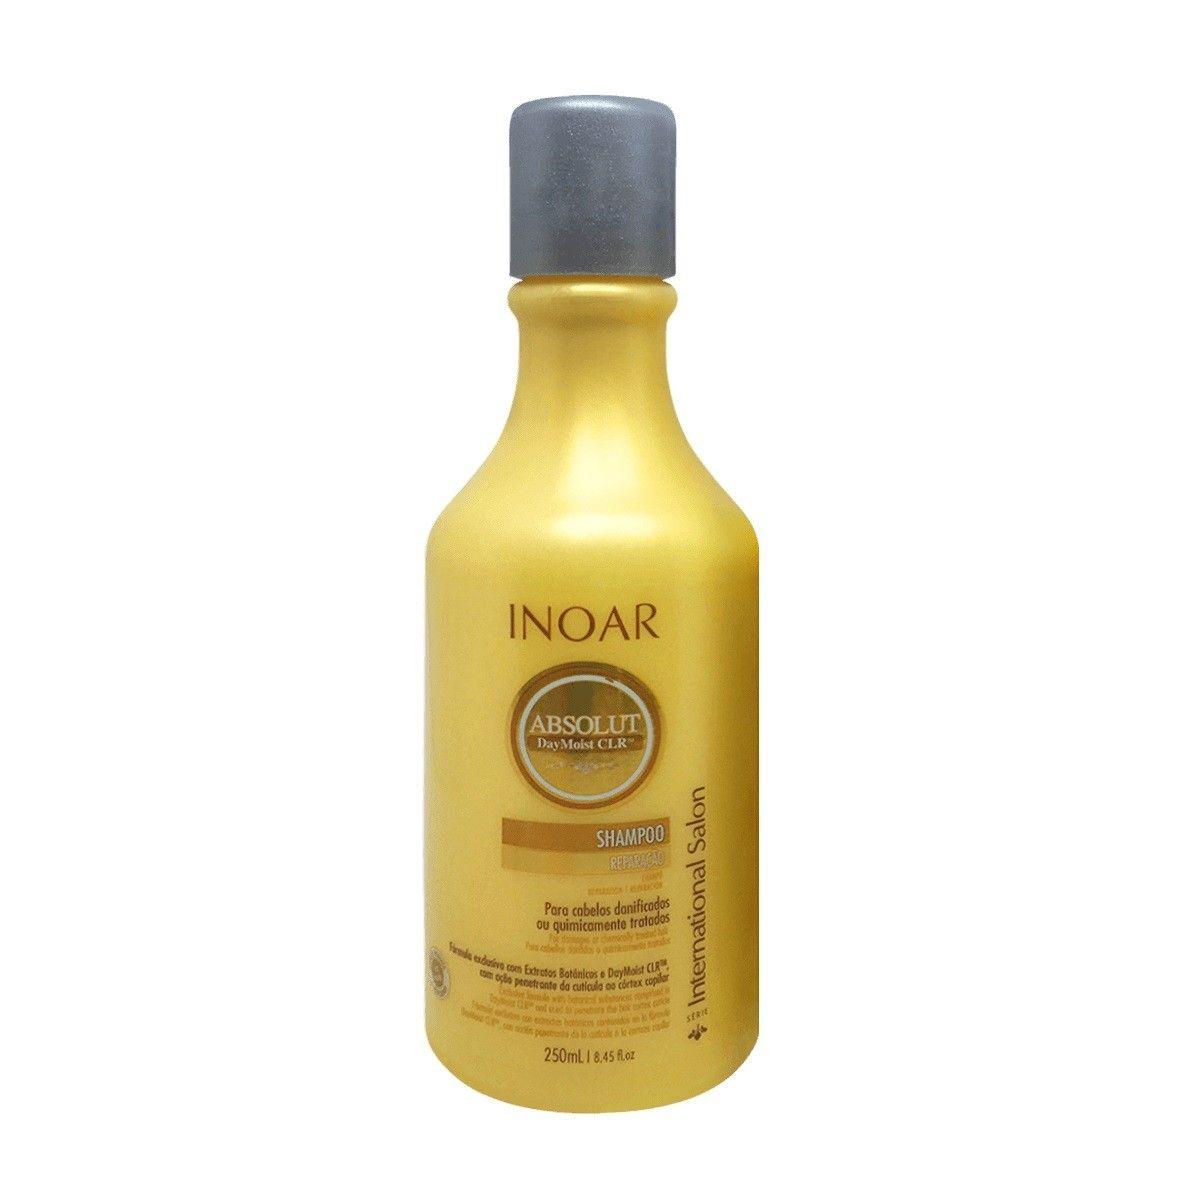 Inoar Shampoo Absolut DayMoist CLR - 250ml